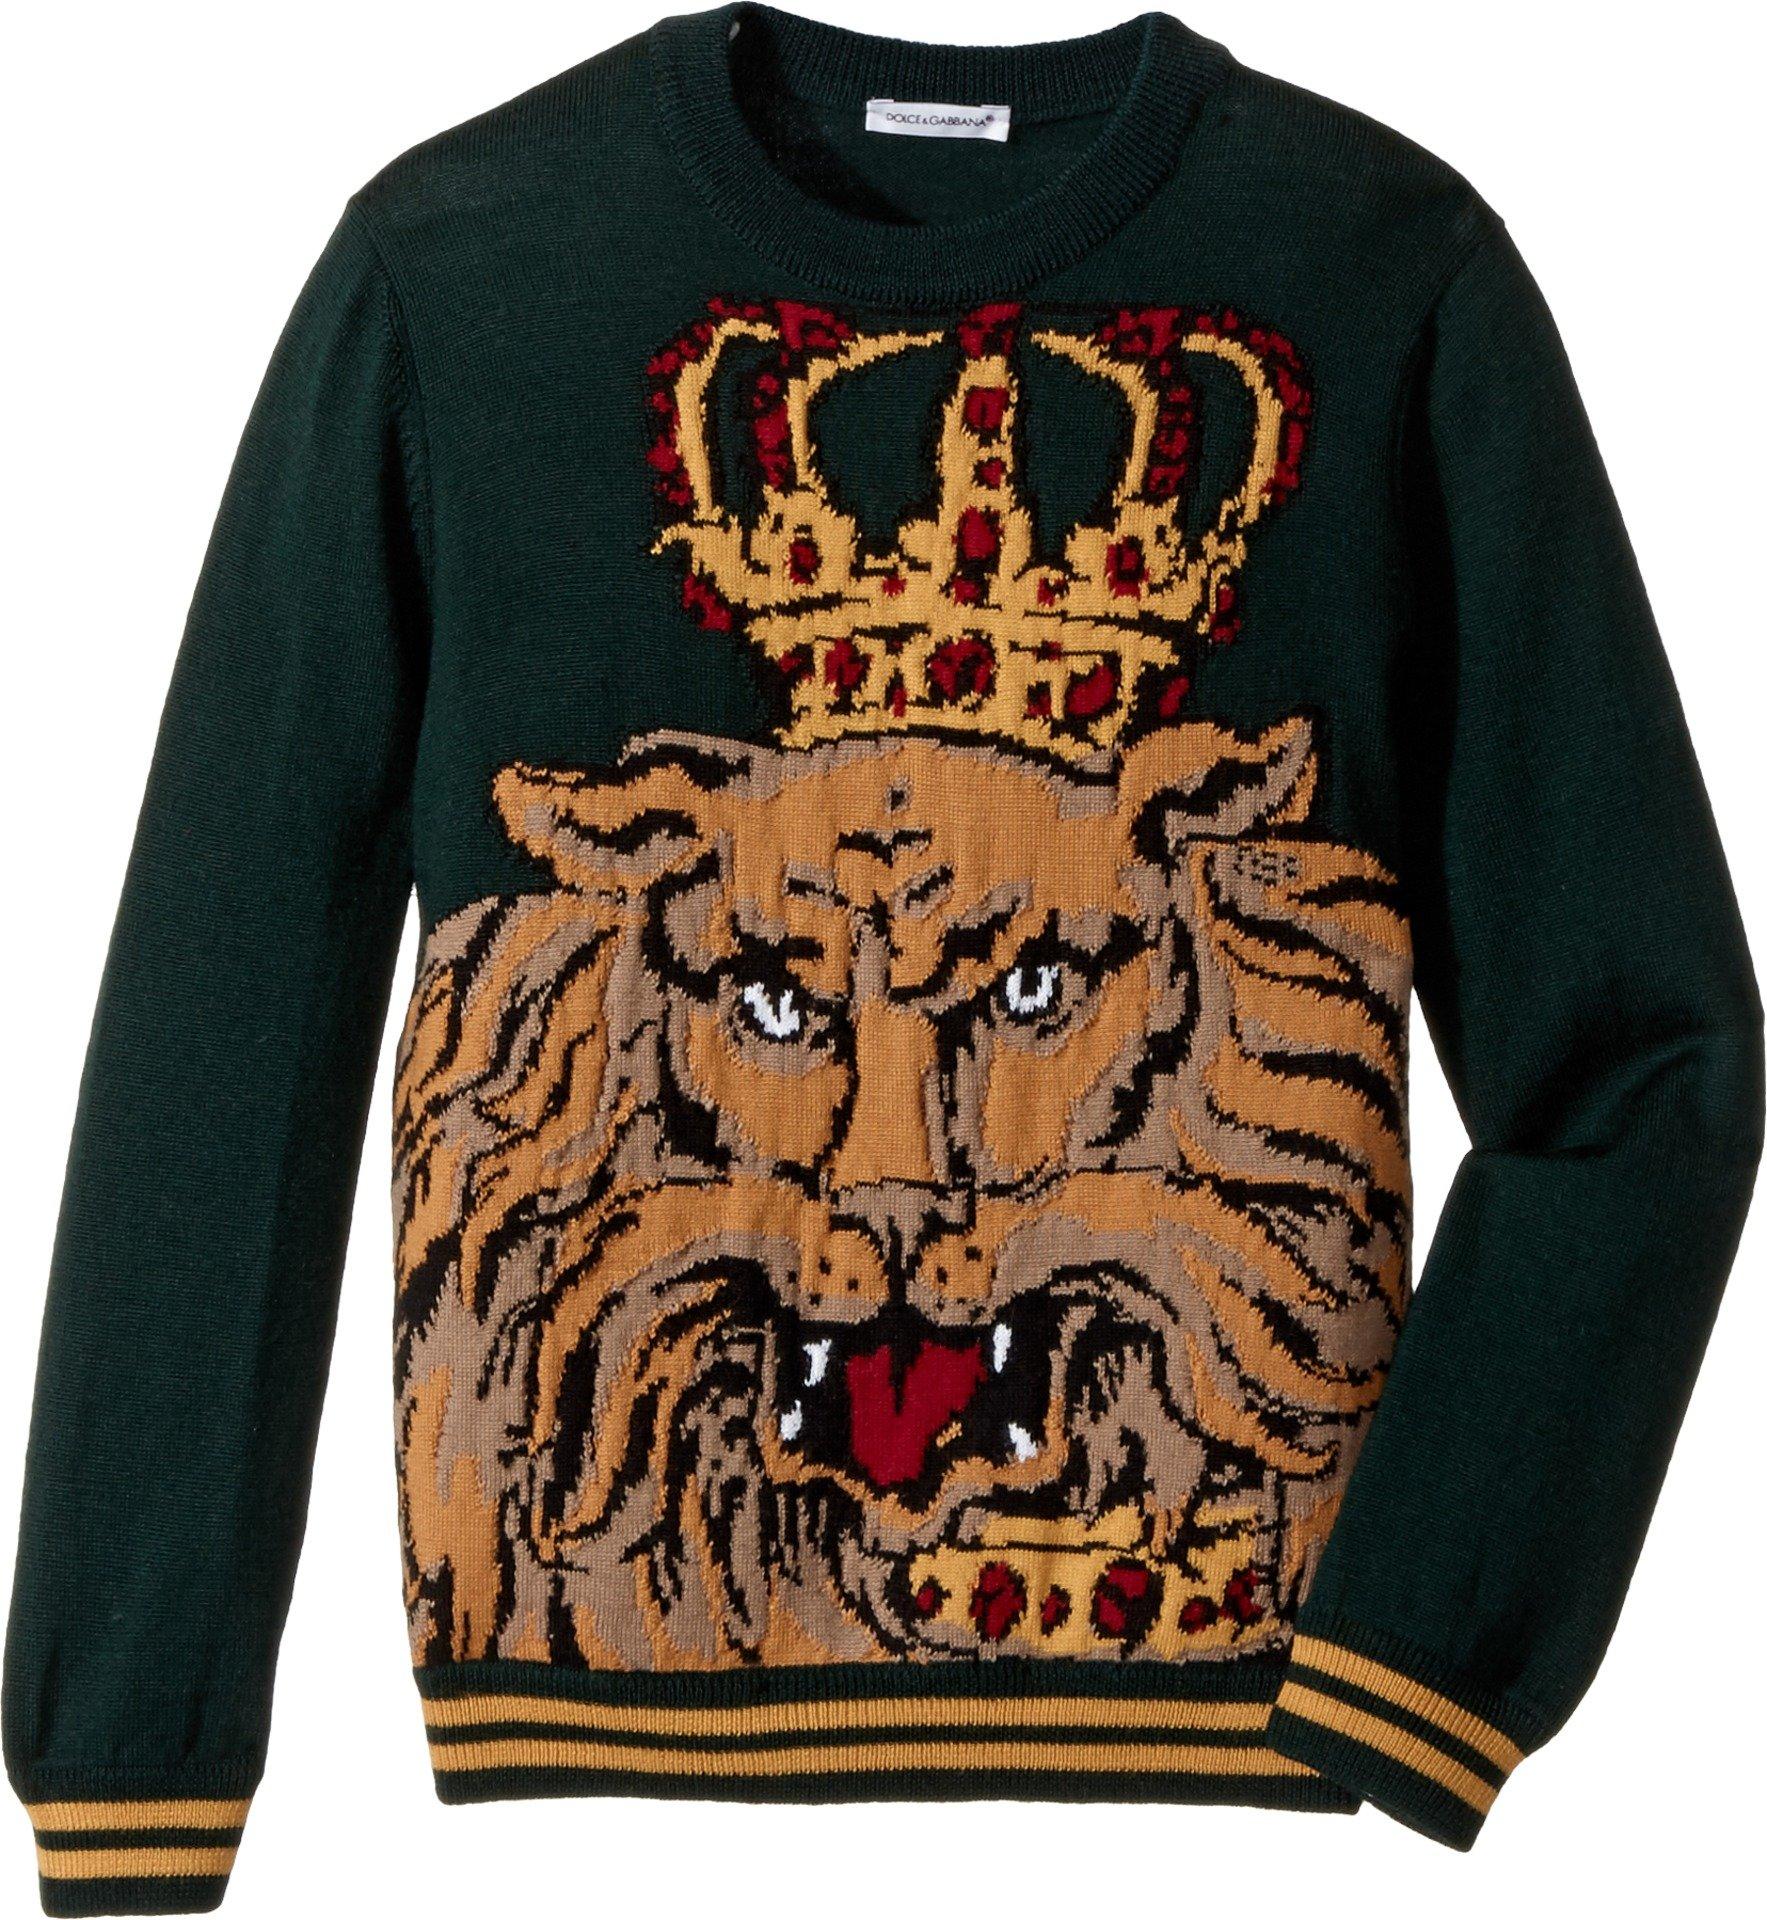 Dolce & Gabbana Kids Baby Boy's Lion King Sweater (Toddler/Little Kids) Green Print 6